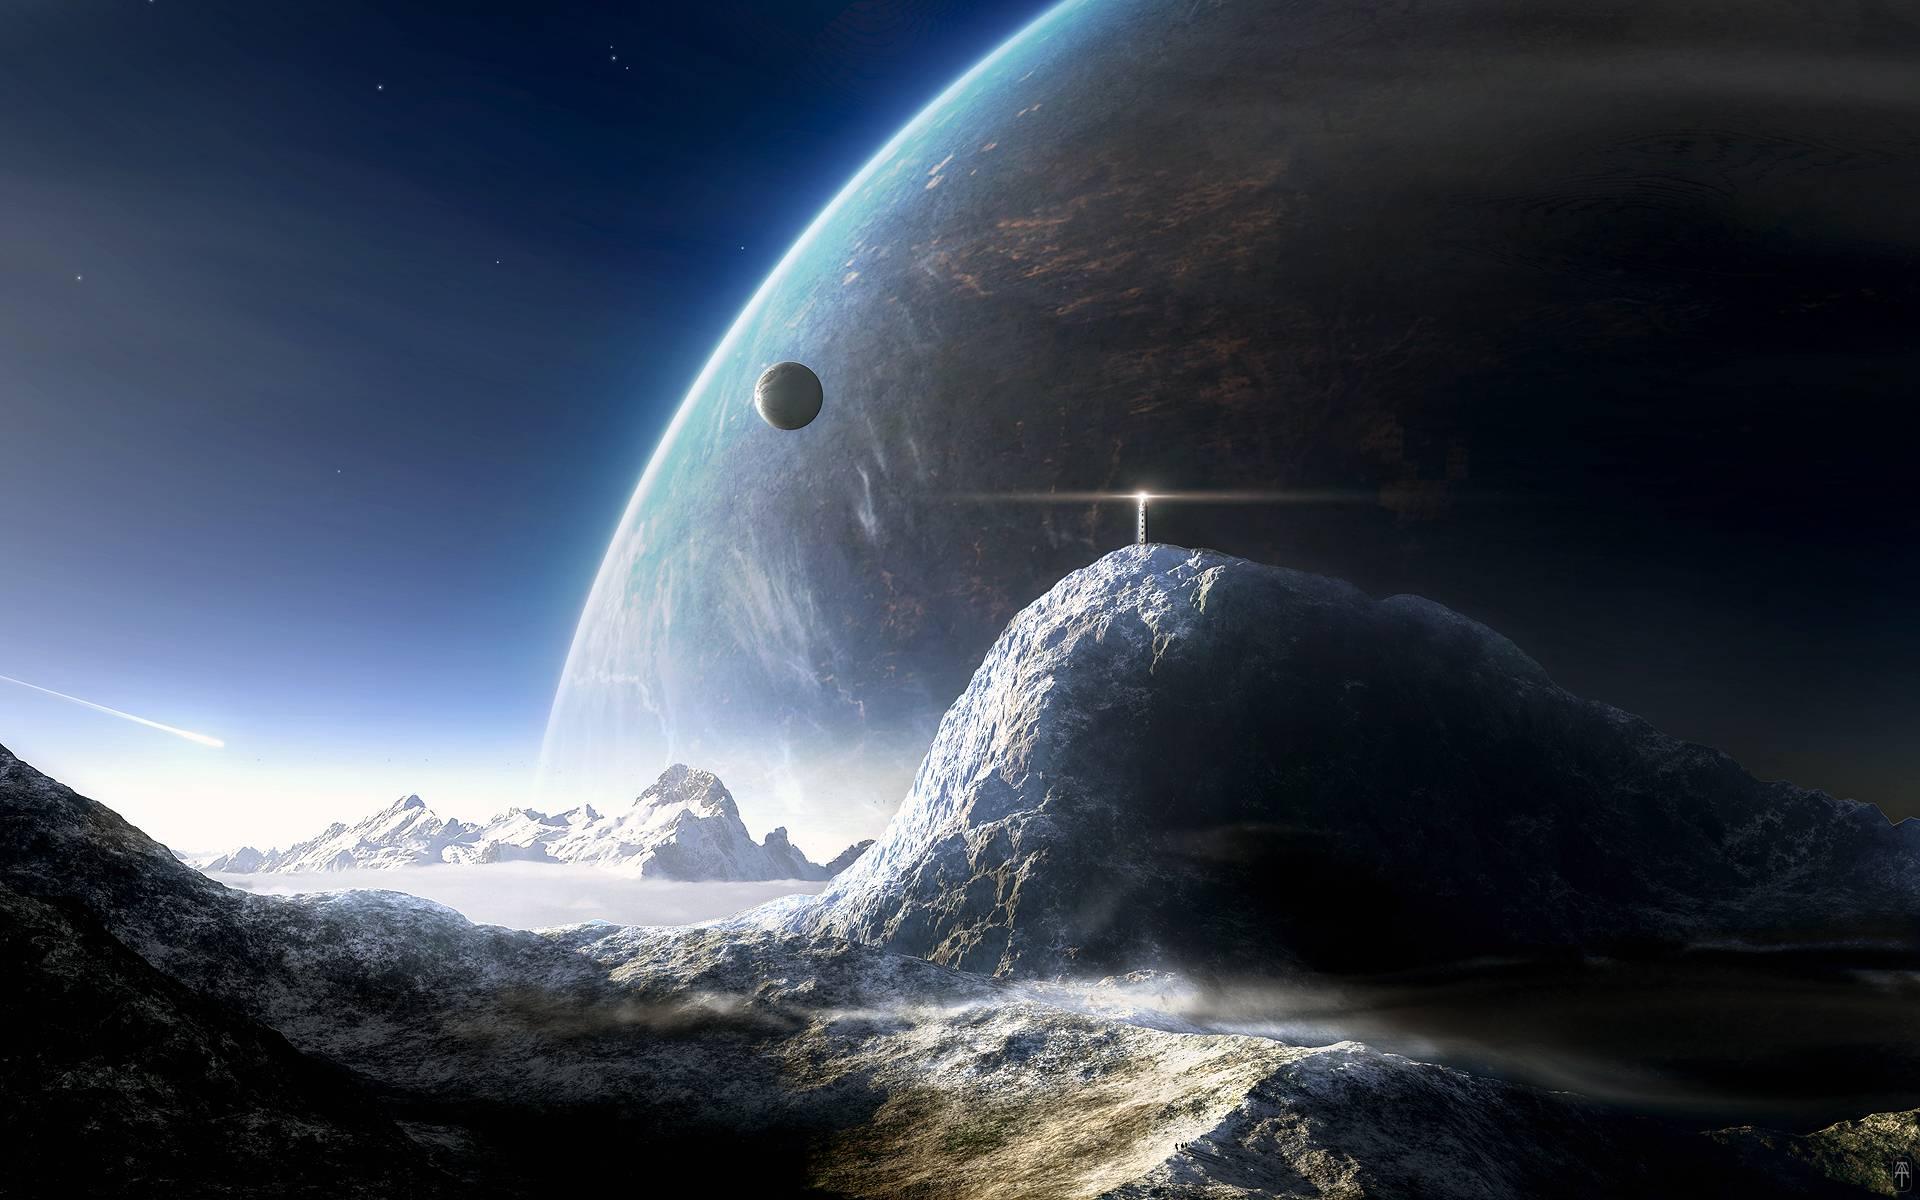 Galaxy Wallpaper Hd - Sci Fi Planet Background , HD Wallpaper & Backgrounds